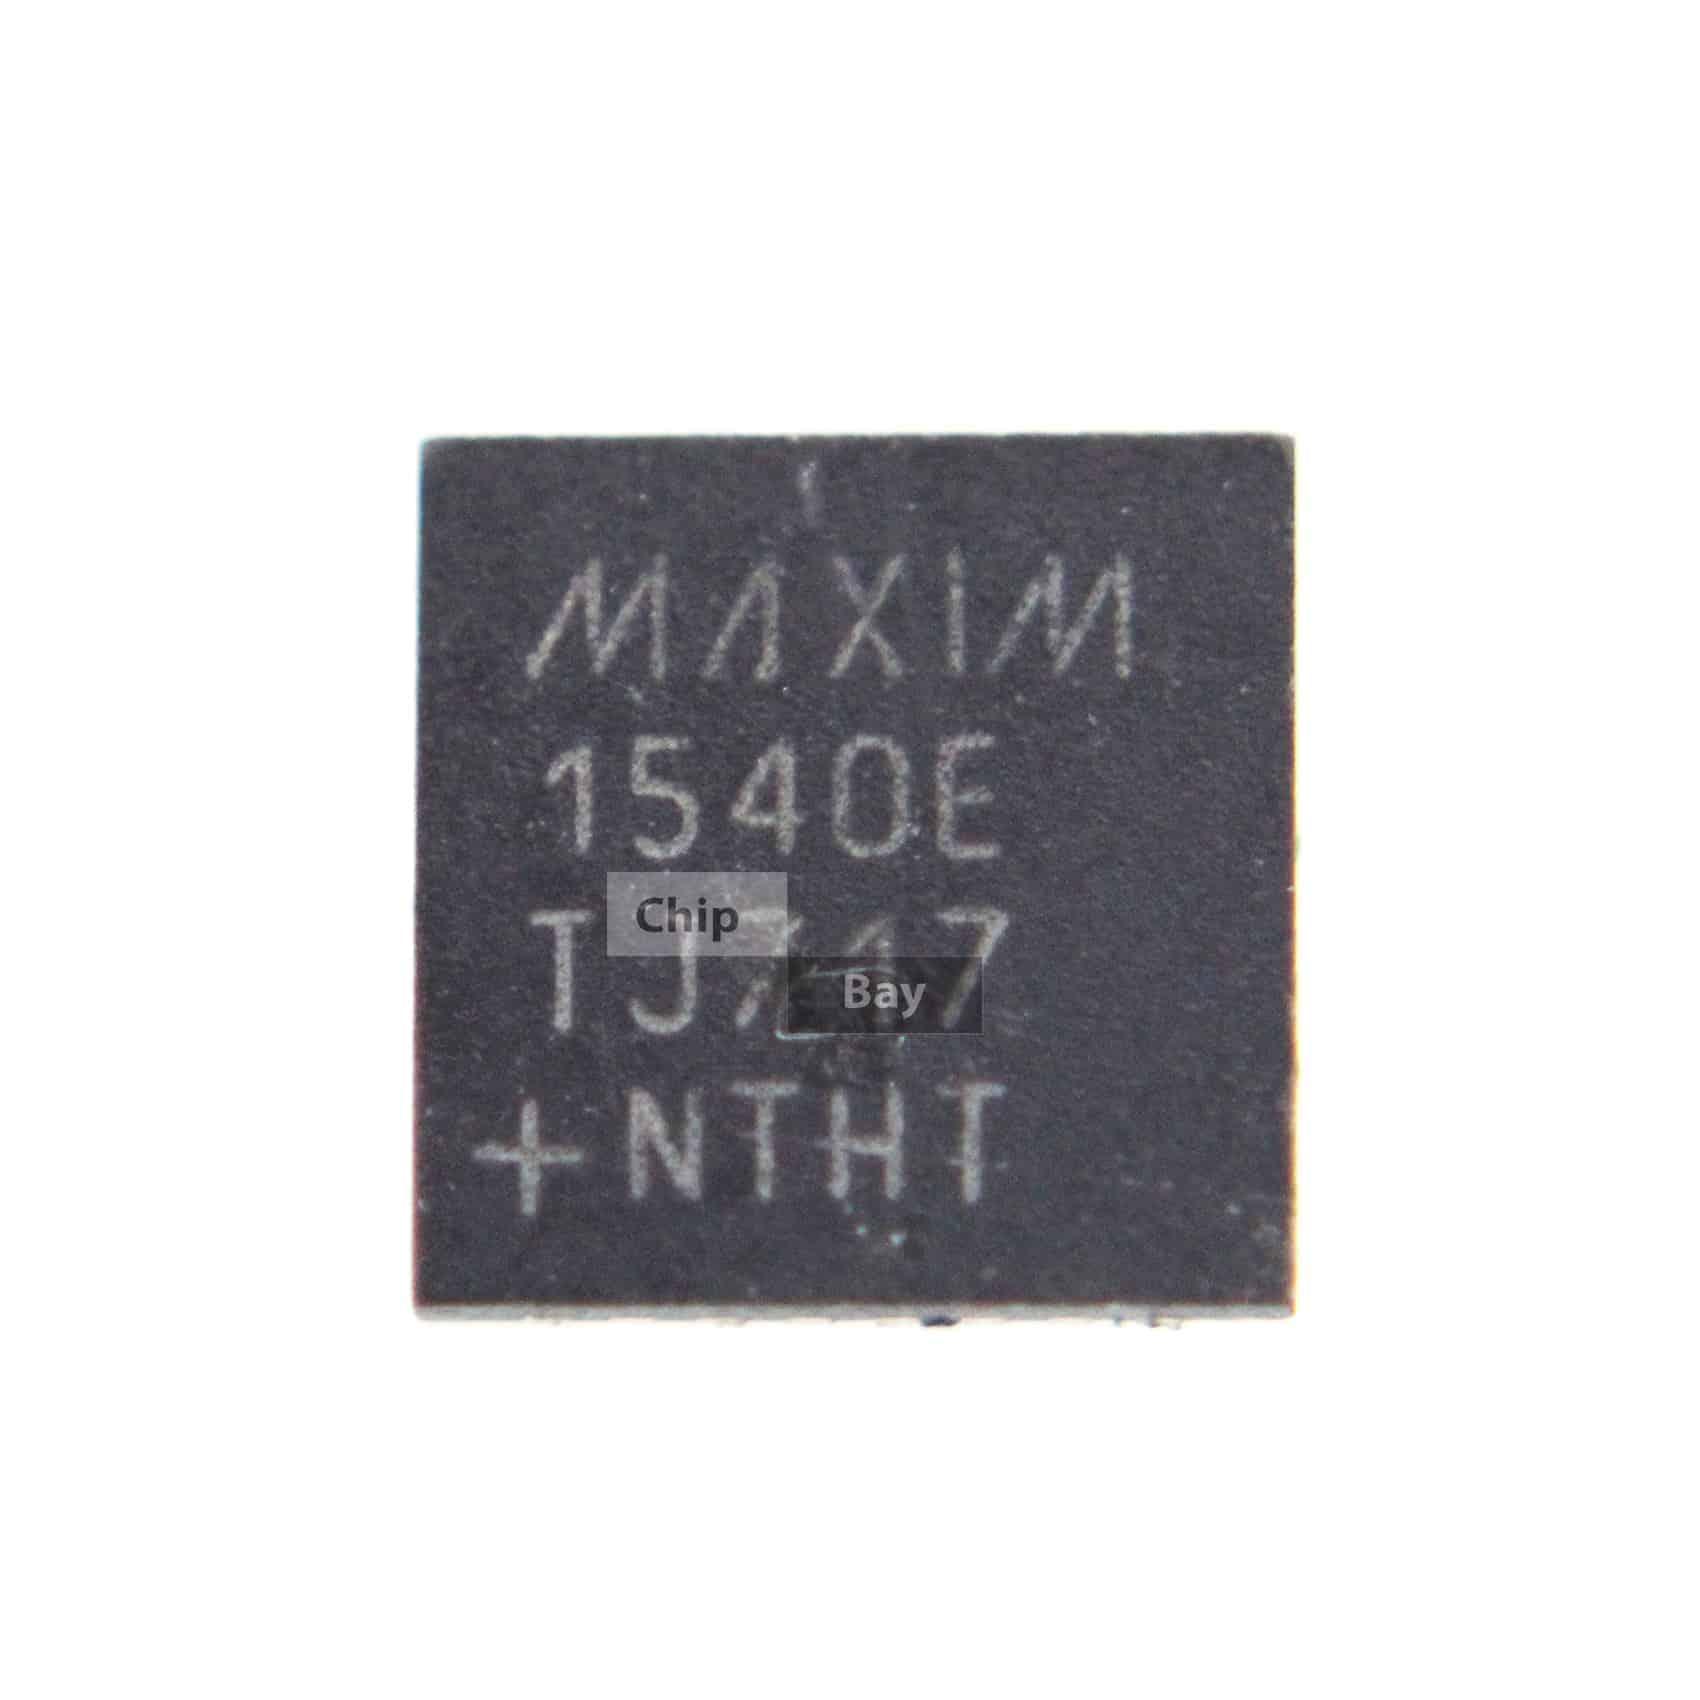 5x MAXB744ETJ 8744ETJ MAX8744E MAX8744ET B744E Max 8744E TJ MAX8744ETJ QFN32 IC